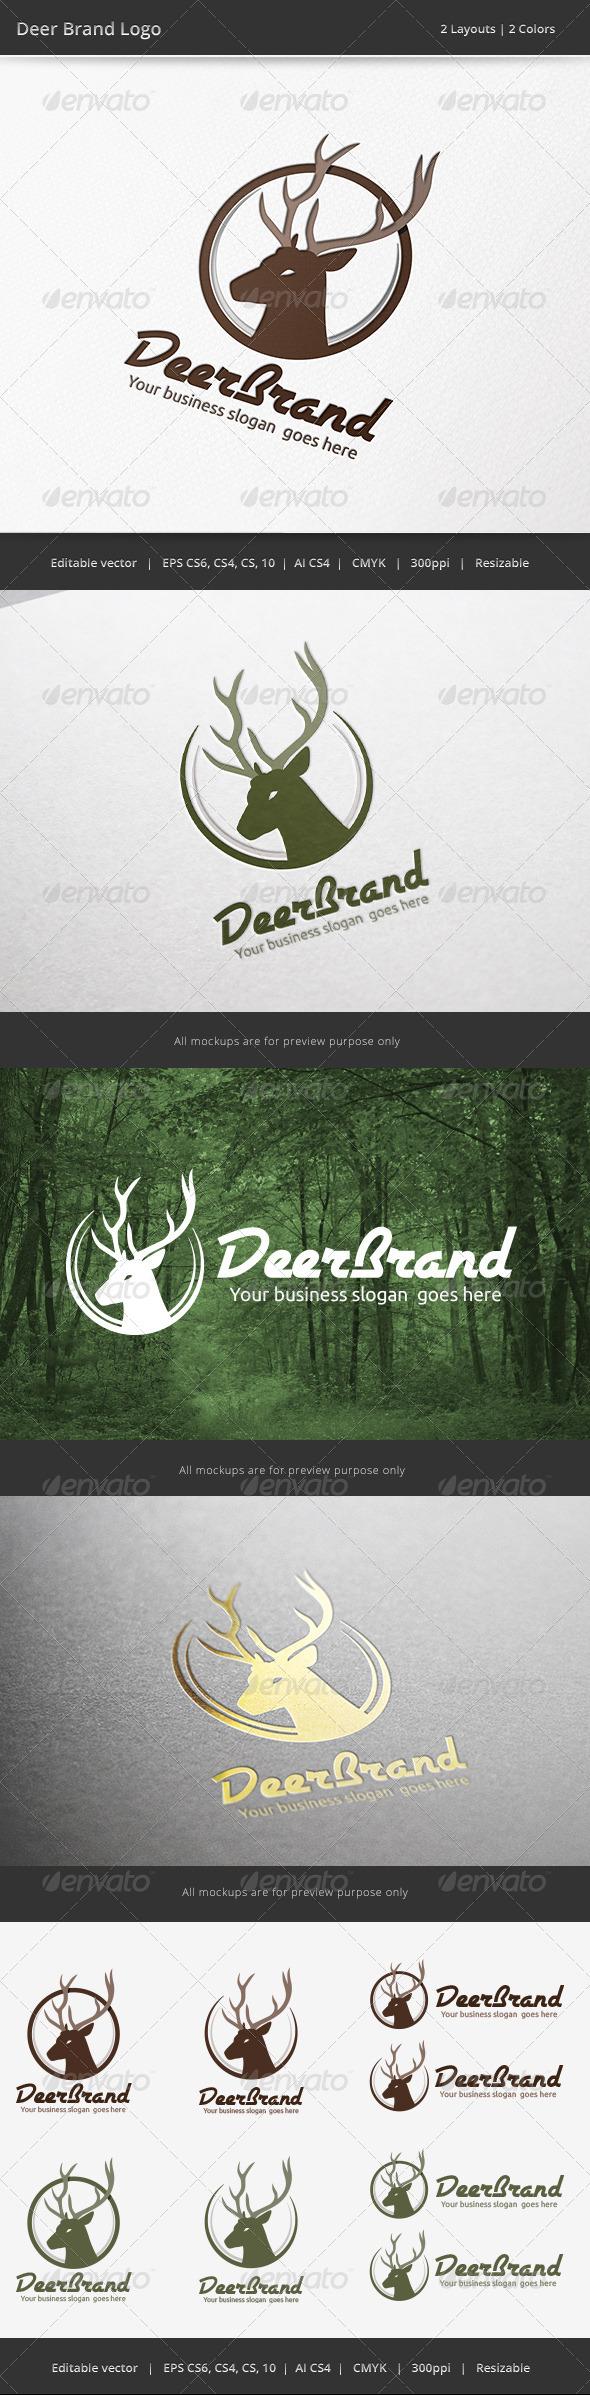 GraphicRiver Deer Brand Logo 7022636